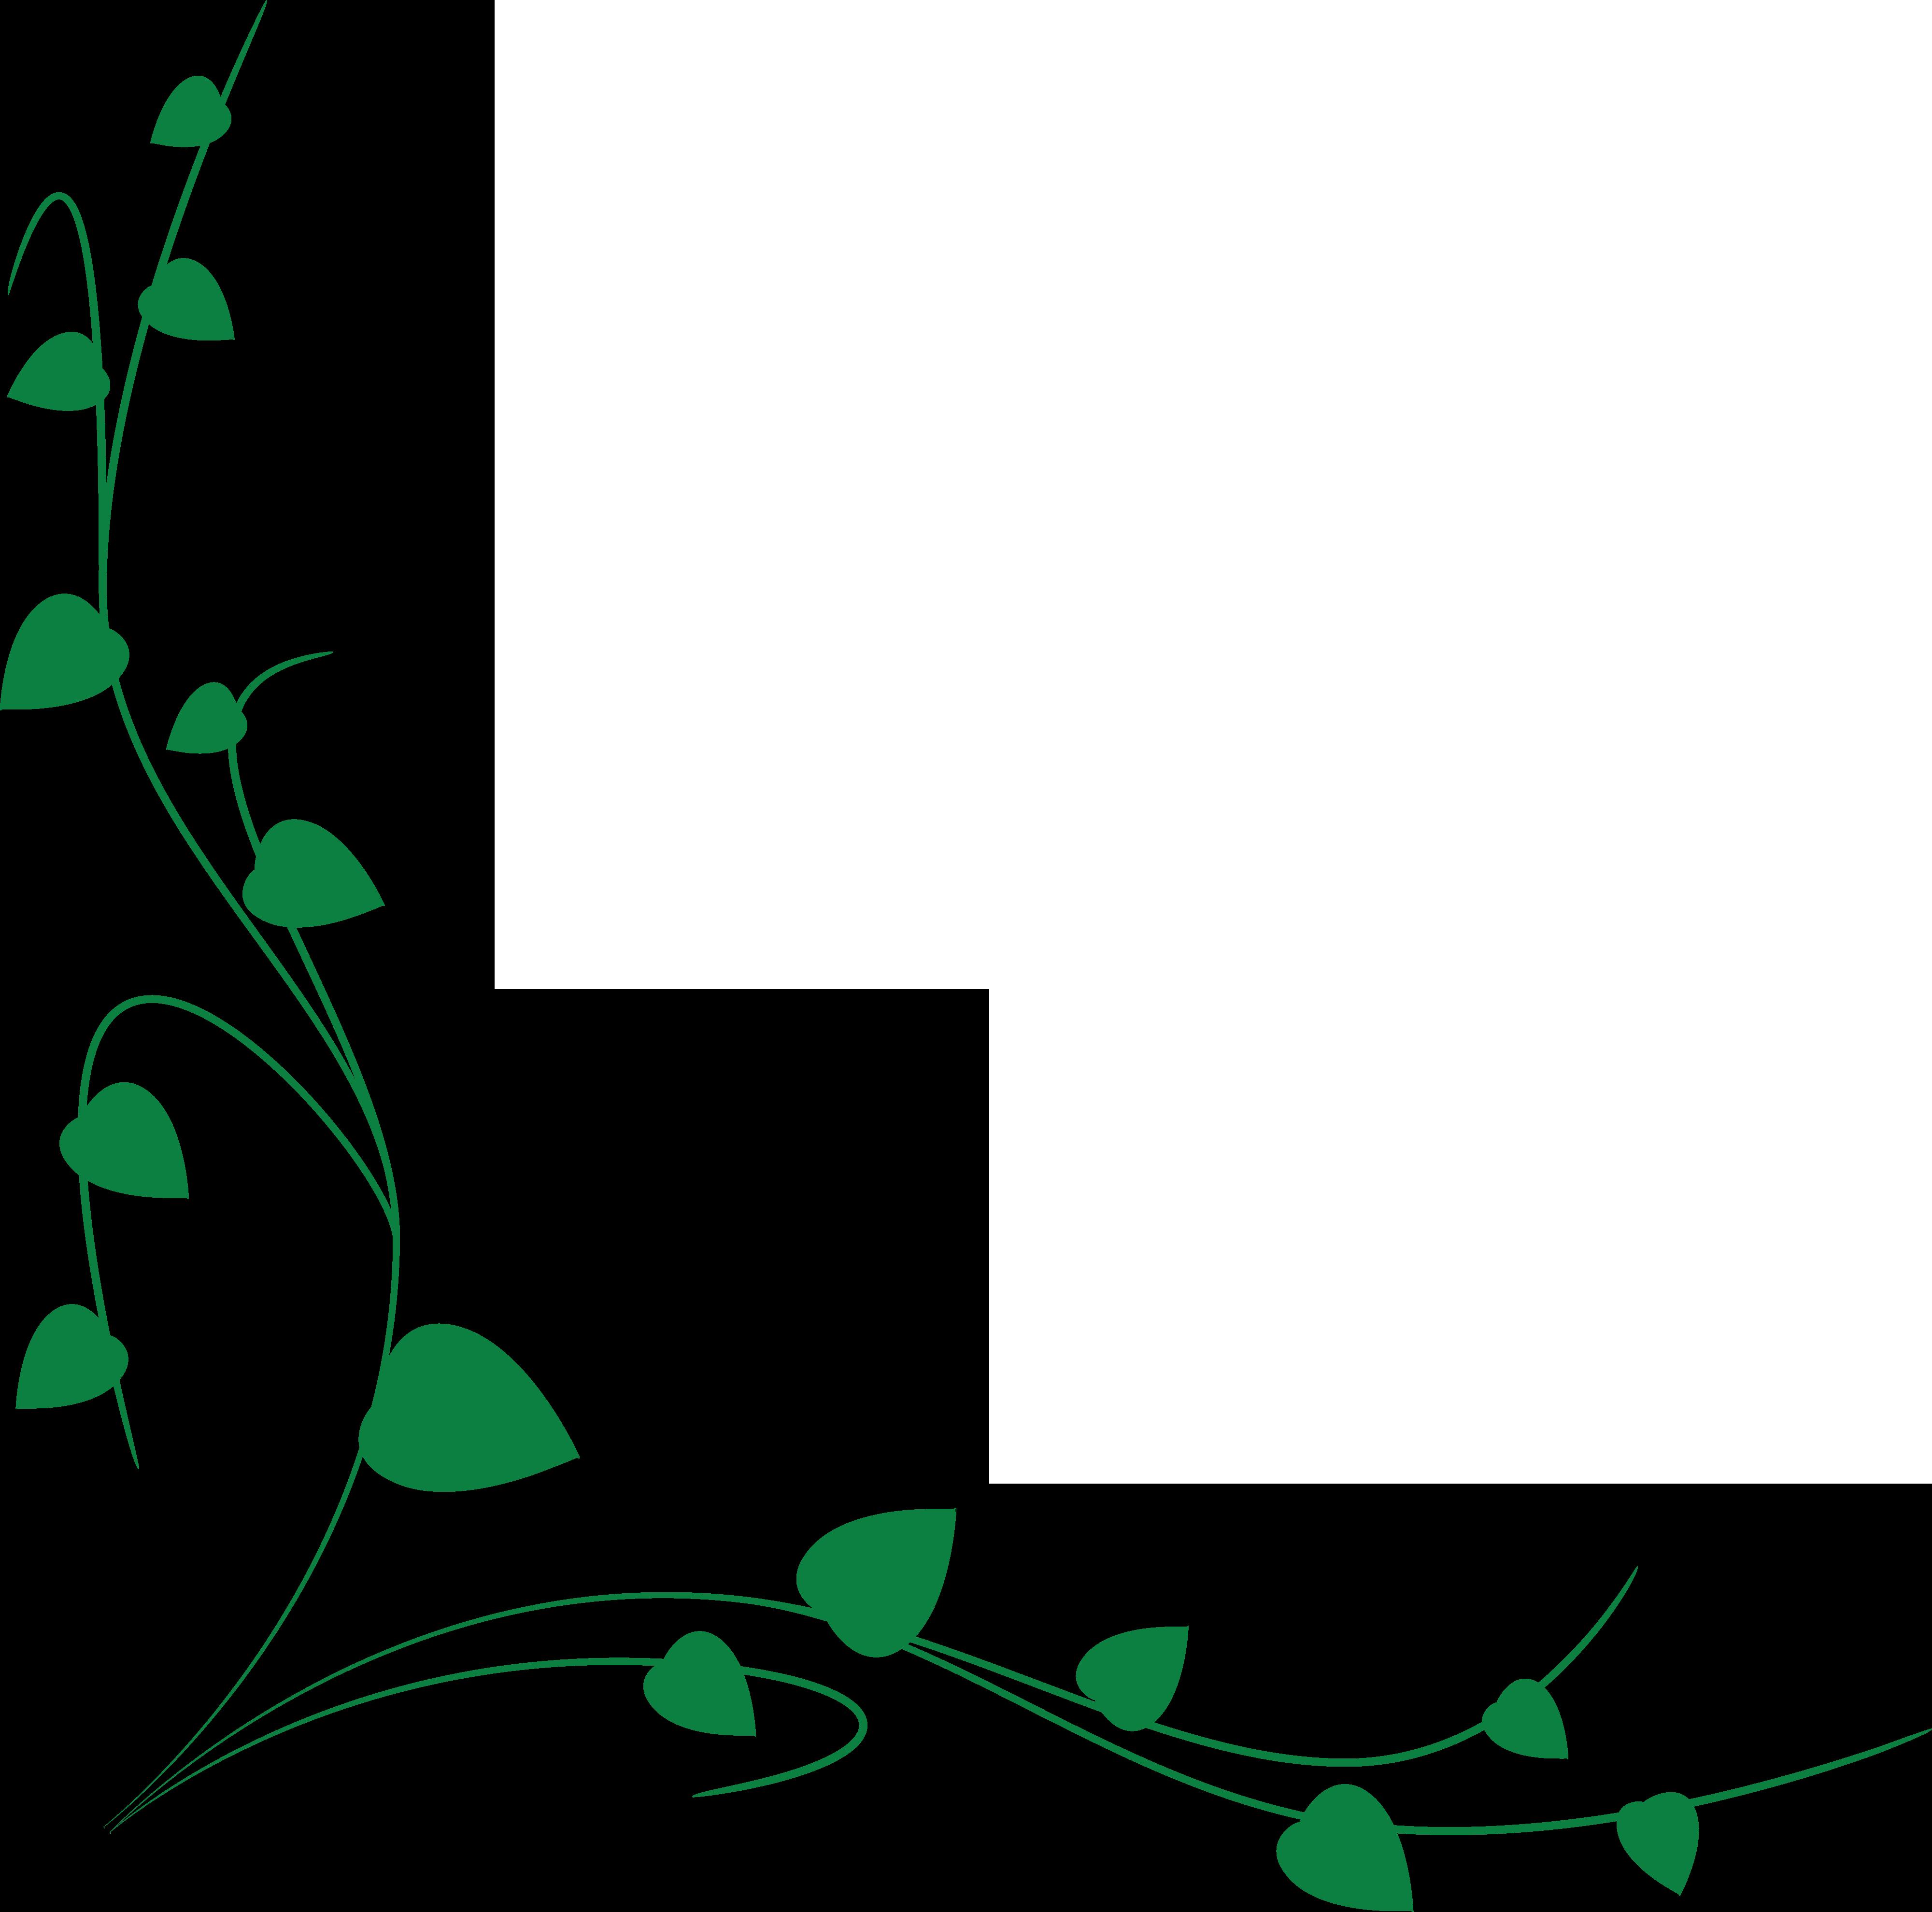 Green Vine Border Clipart.